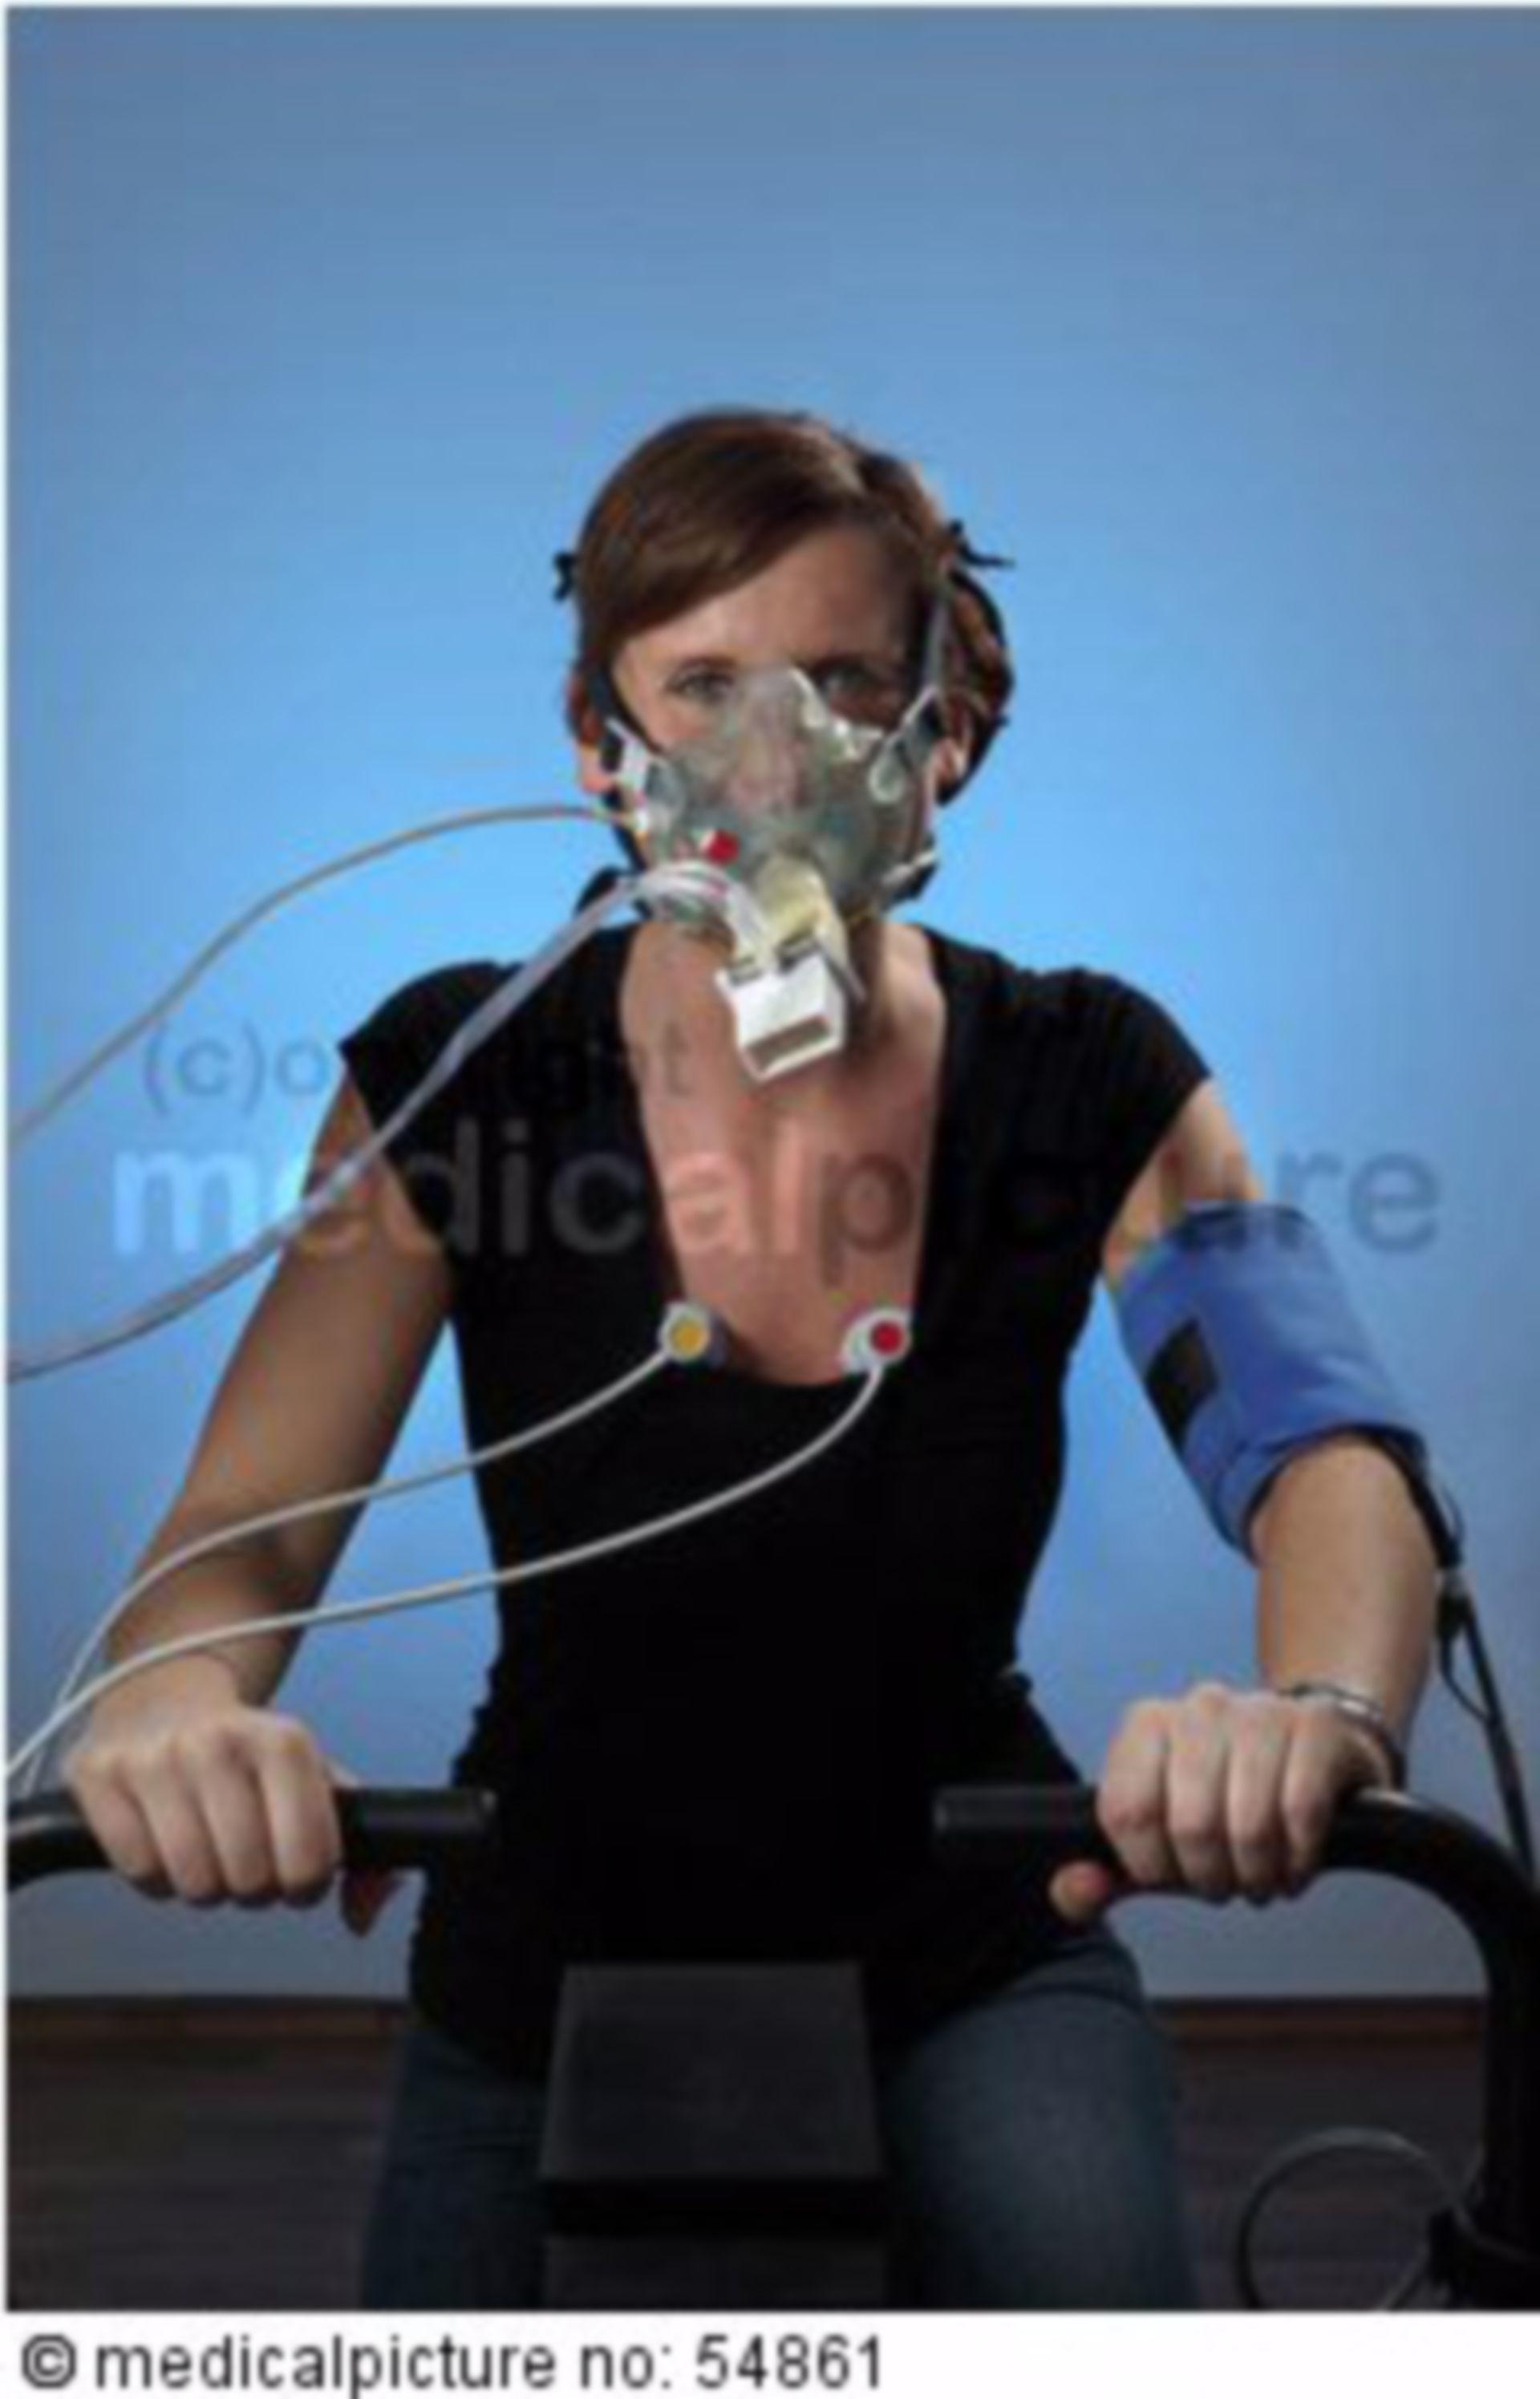 Spiroergometrie, Sportmedizin